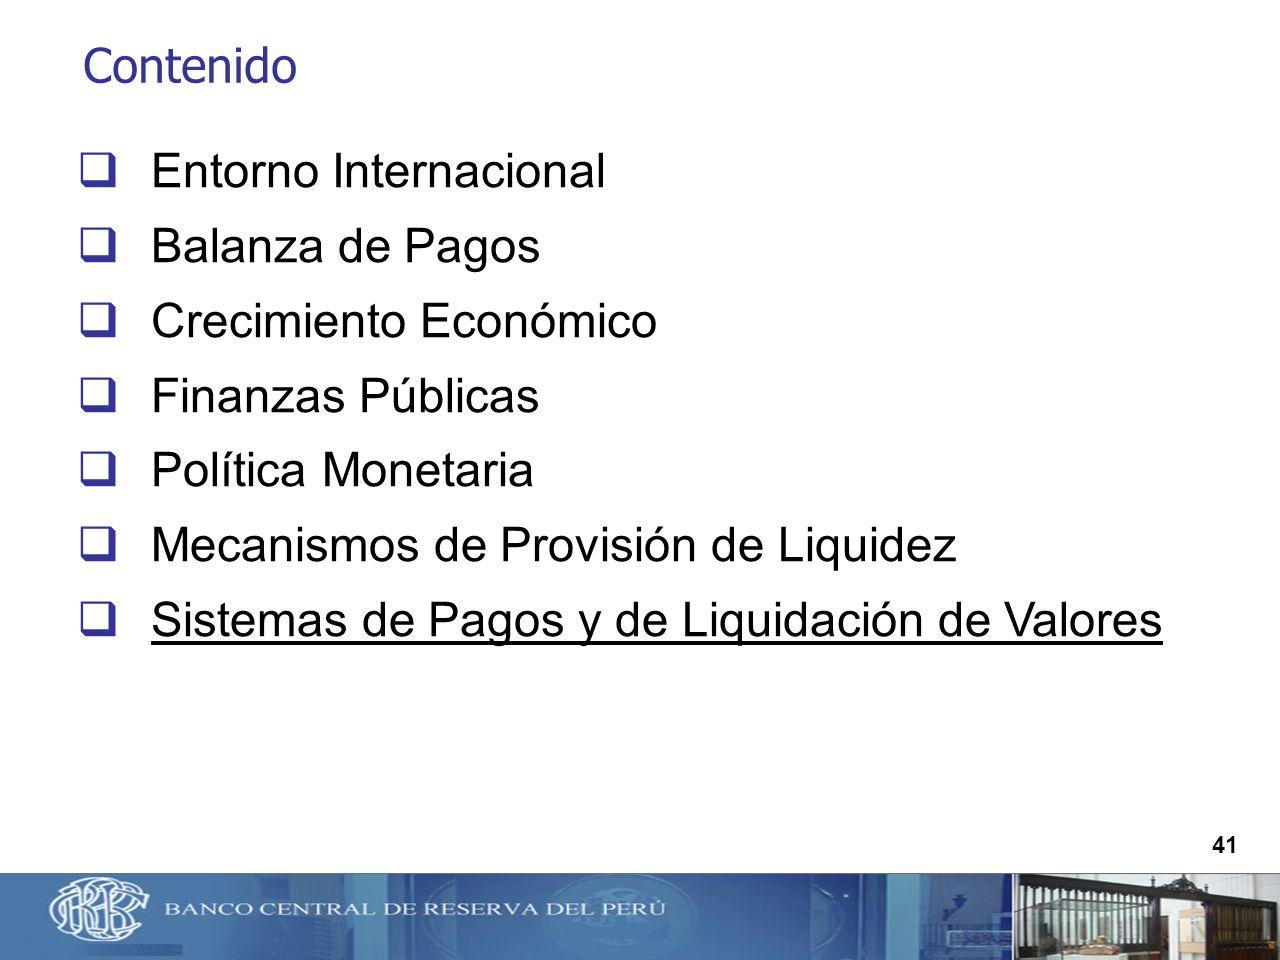 41 Contenido Entorno Internacional Balanza de Pagos Crecimiento Económico Finanzas Públicas Política Monetaria Mecanismos de Provisión de Liquidez Sis